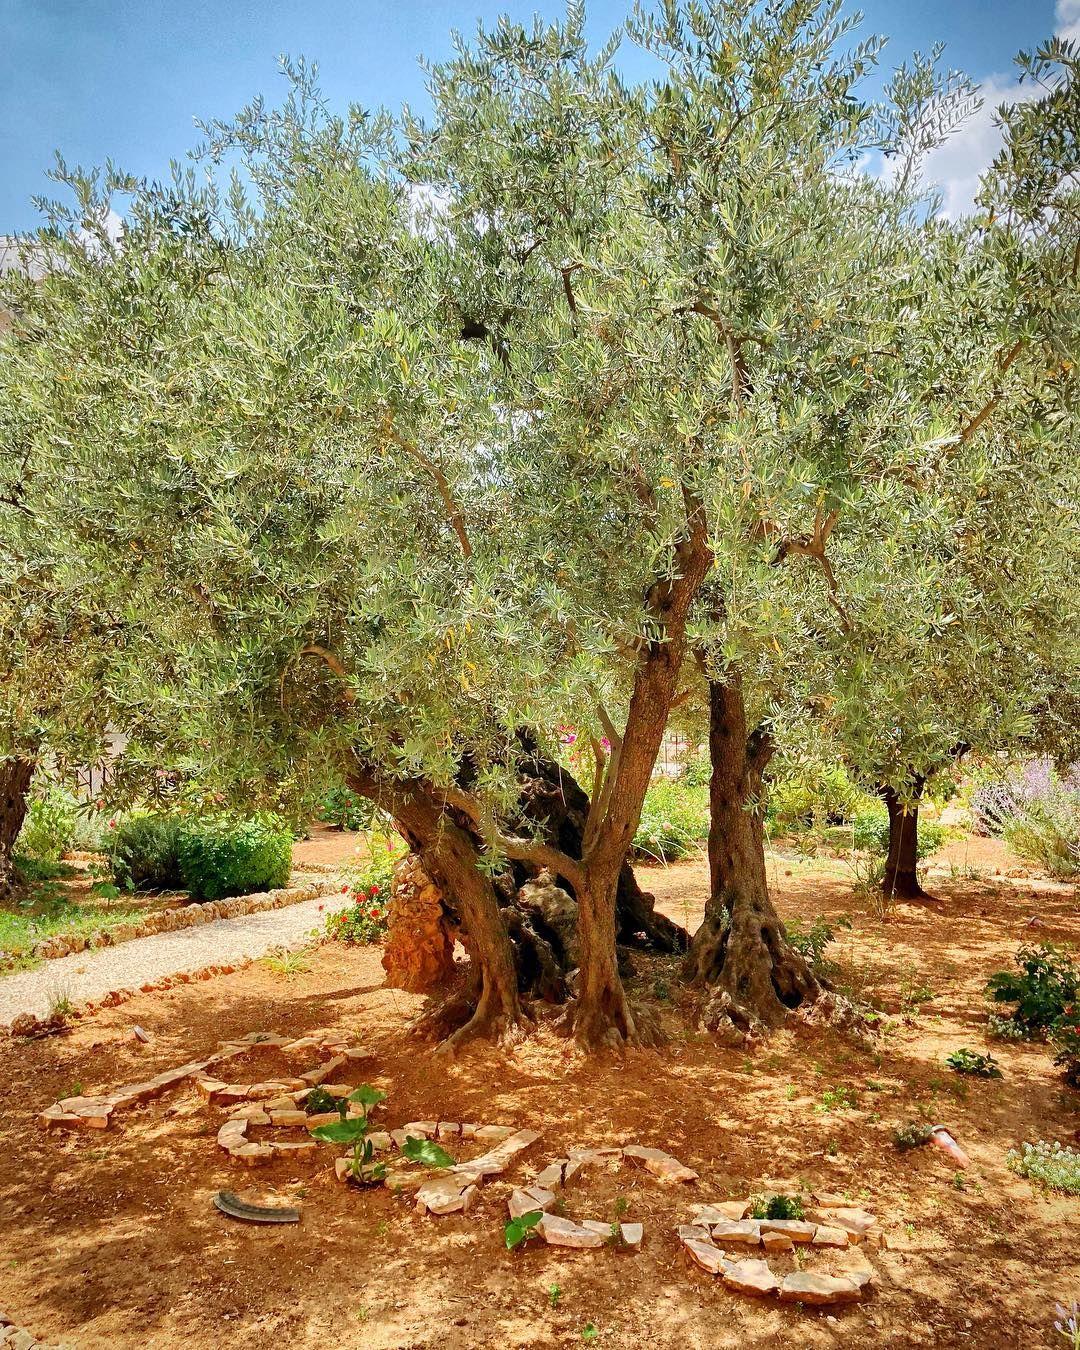 Olive Trees In The Garden Of Gethsemane Peace Gethsemane Jerusalem Israel Travelphotography Traveltheworld Travelblogger Wanderer Natur